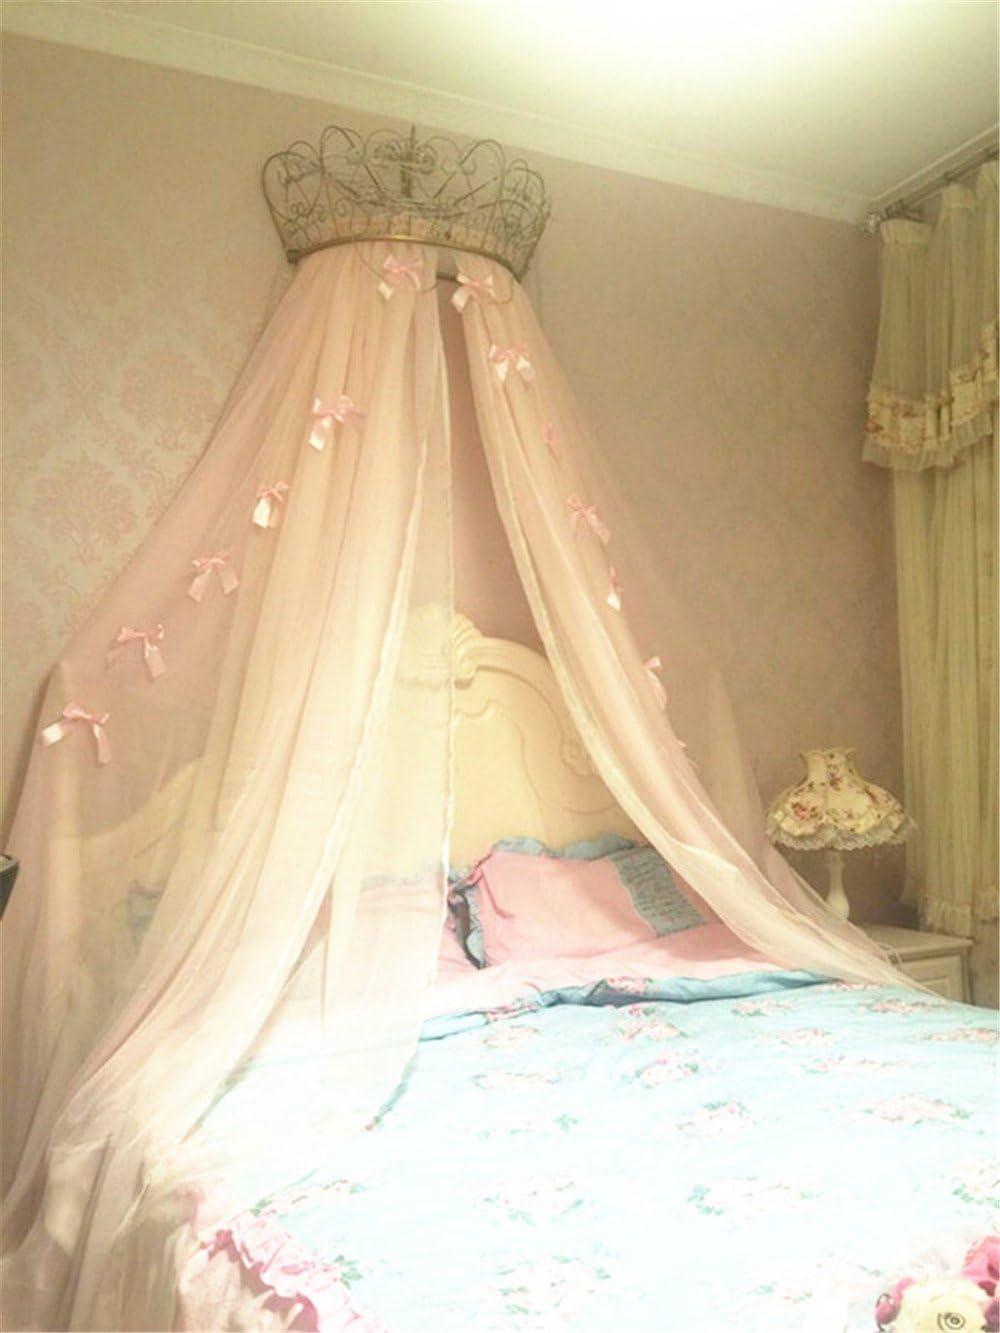 - Amazon.com: Lotus Karen Princess Bed Canopy Chiffon Girls Bed